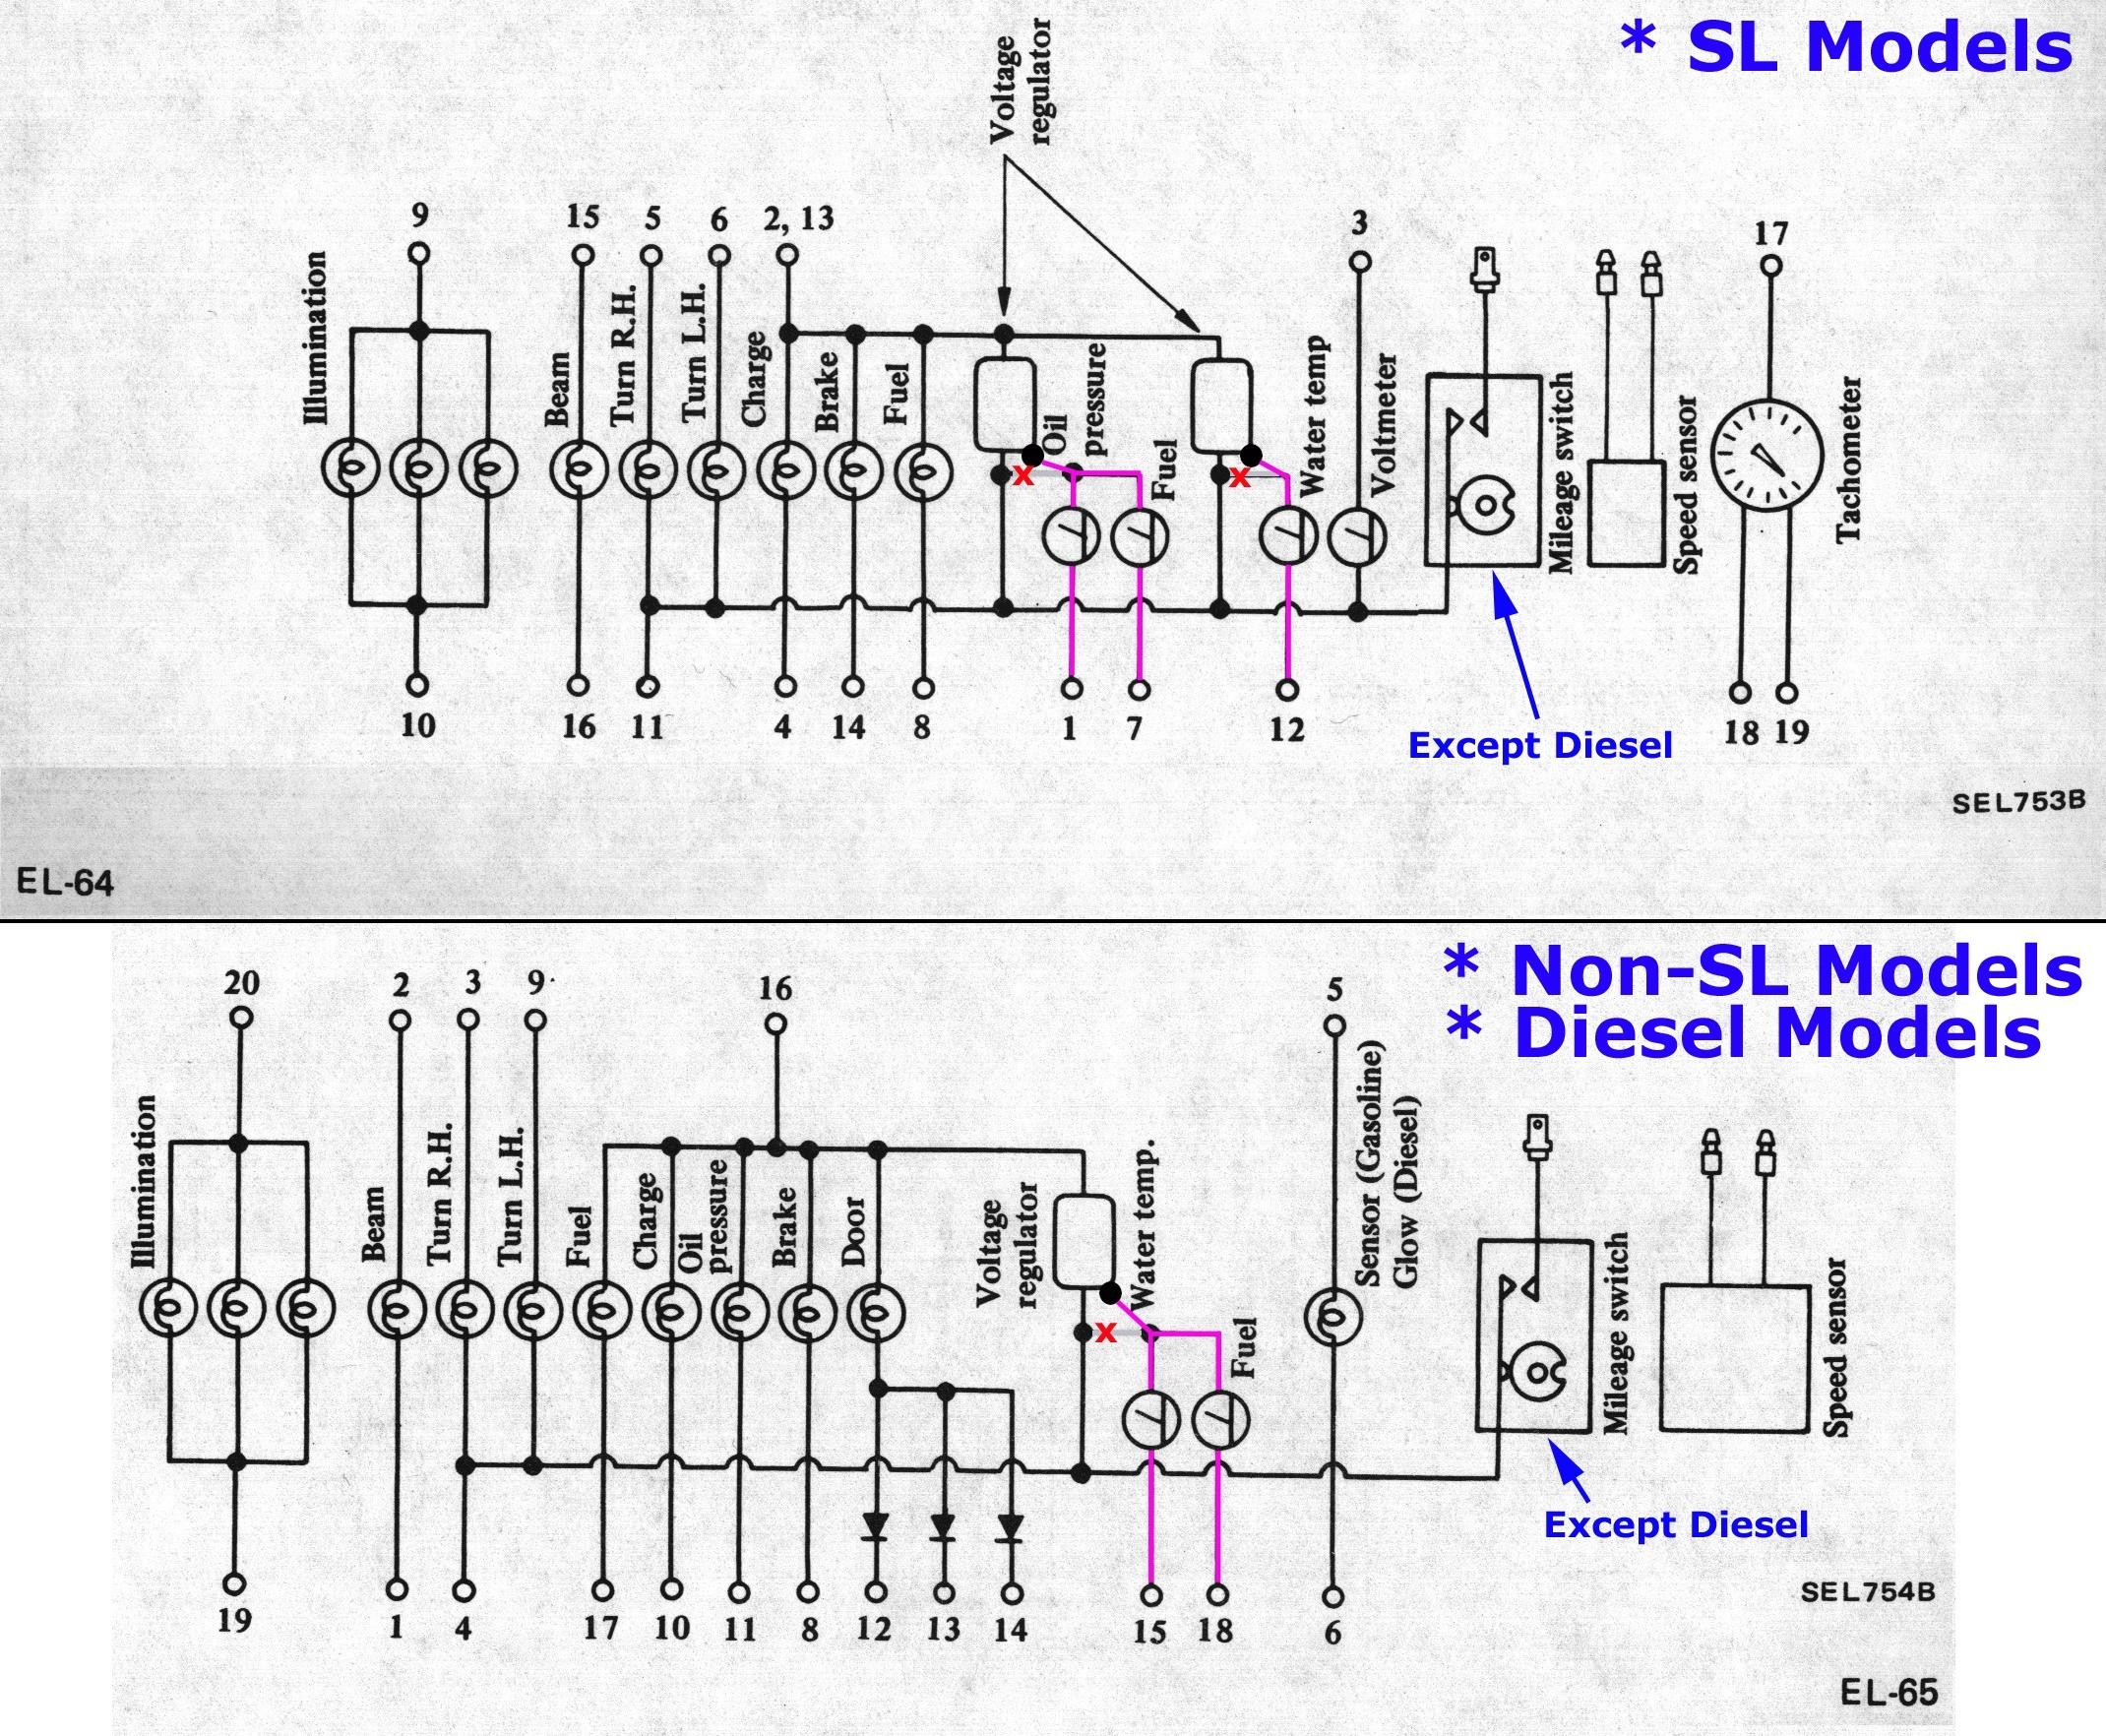 2004 Nissan Maxima Engine Diagram Index Of Nissan Maxima